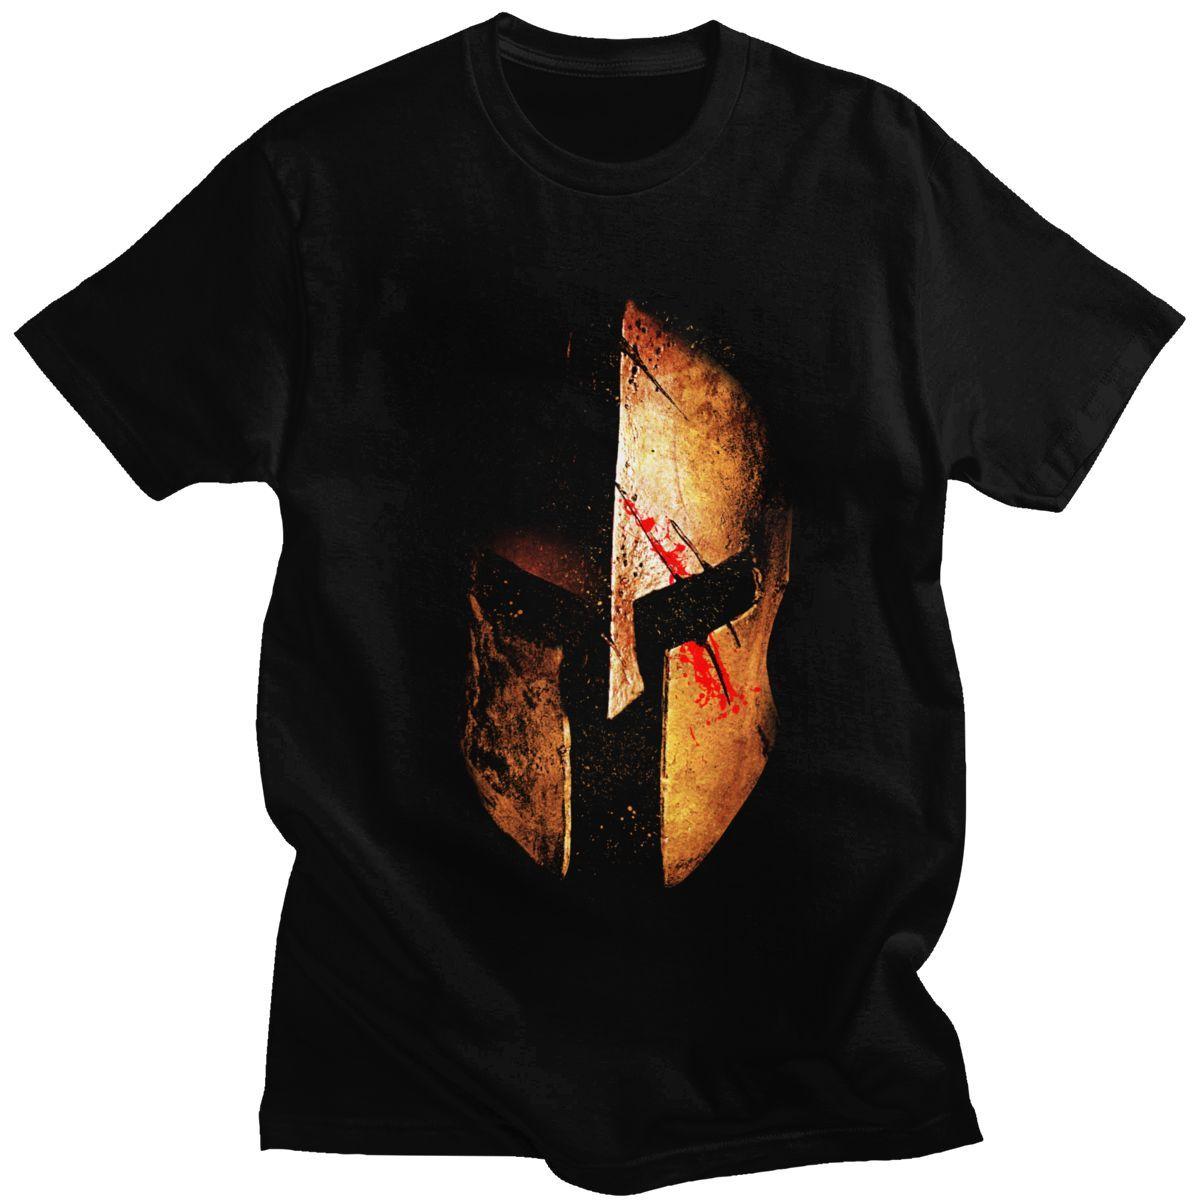 Cool Gold Metal Blood Spartan T Shirt Short Sleeve Cotton Sparta Trojan Helmet T-Shirt Streetwear Casual Tee Tops Clothing Merch